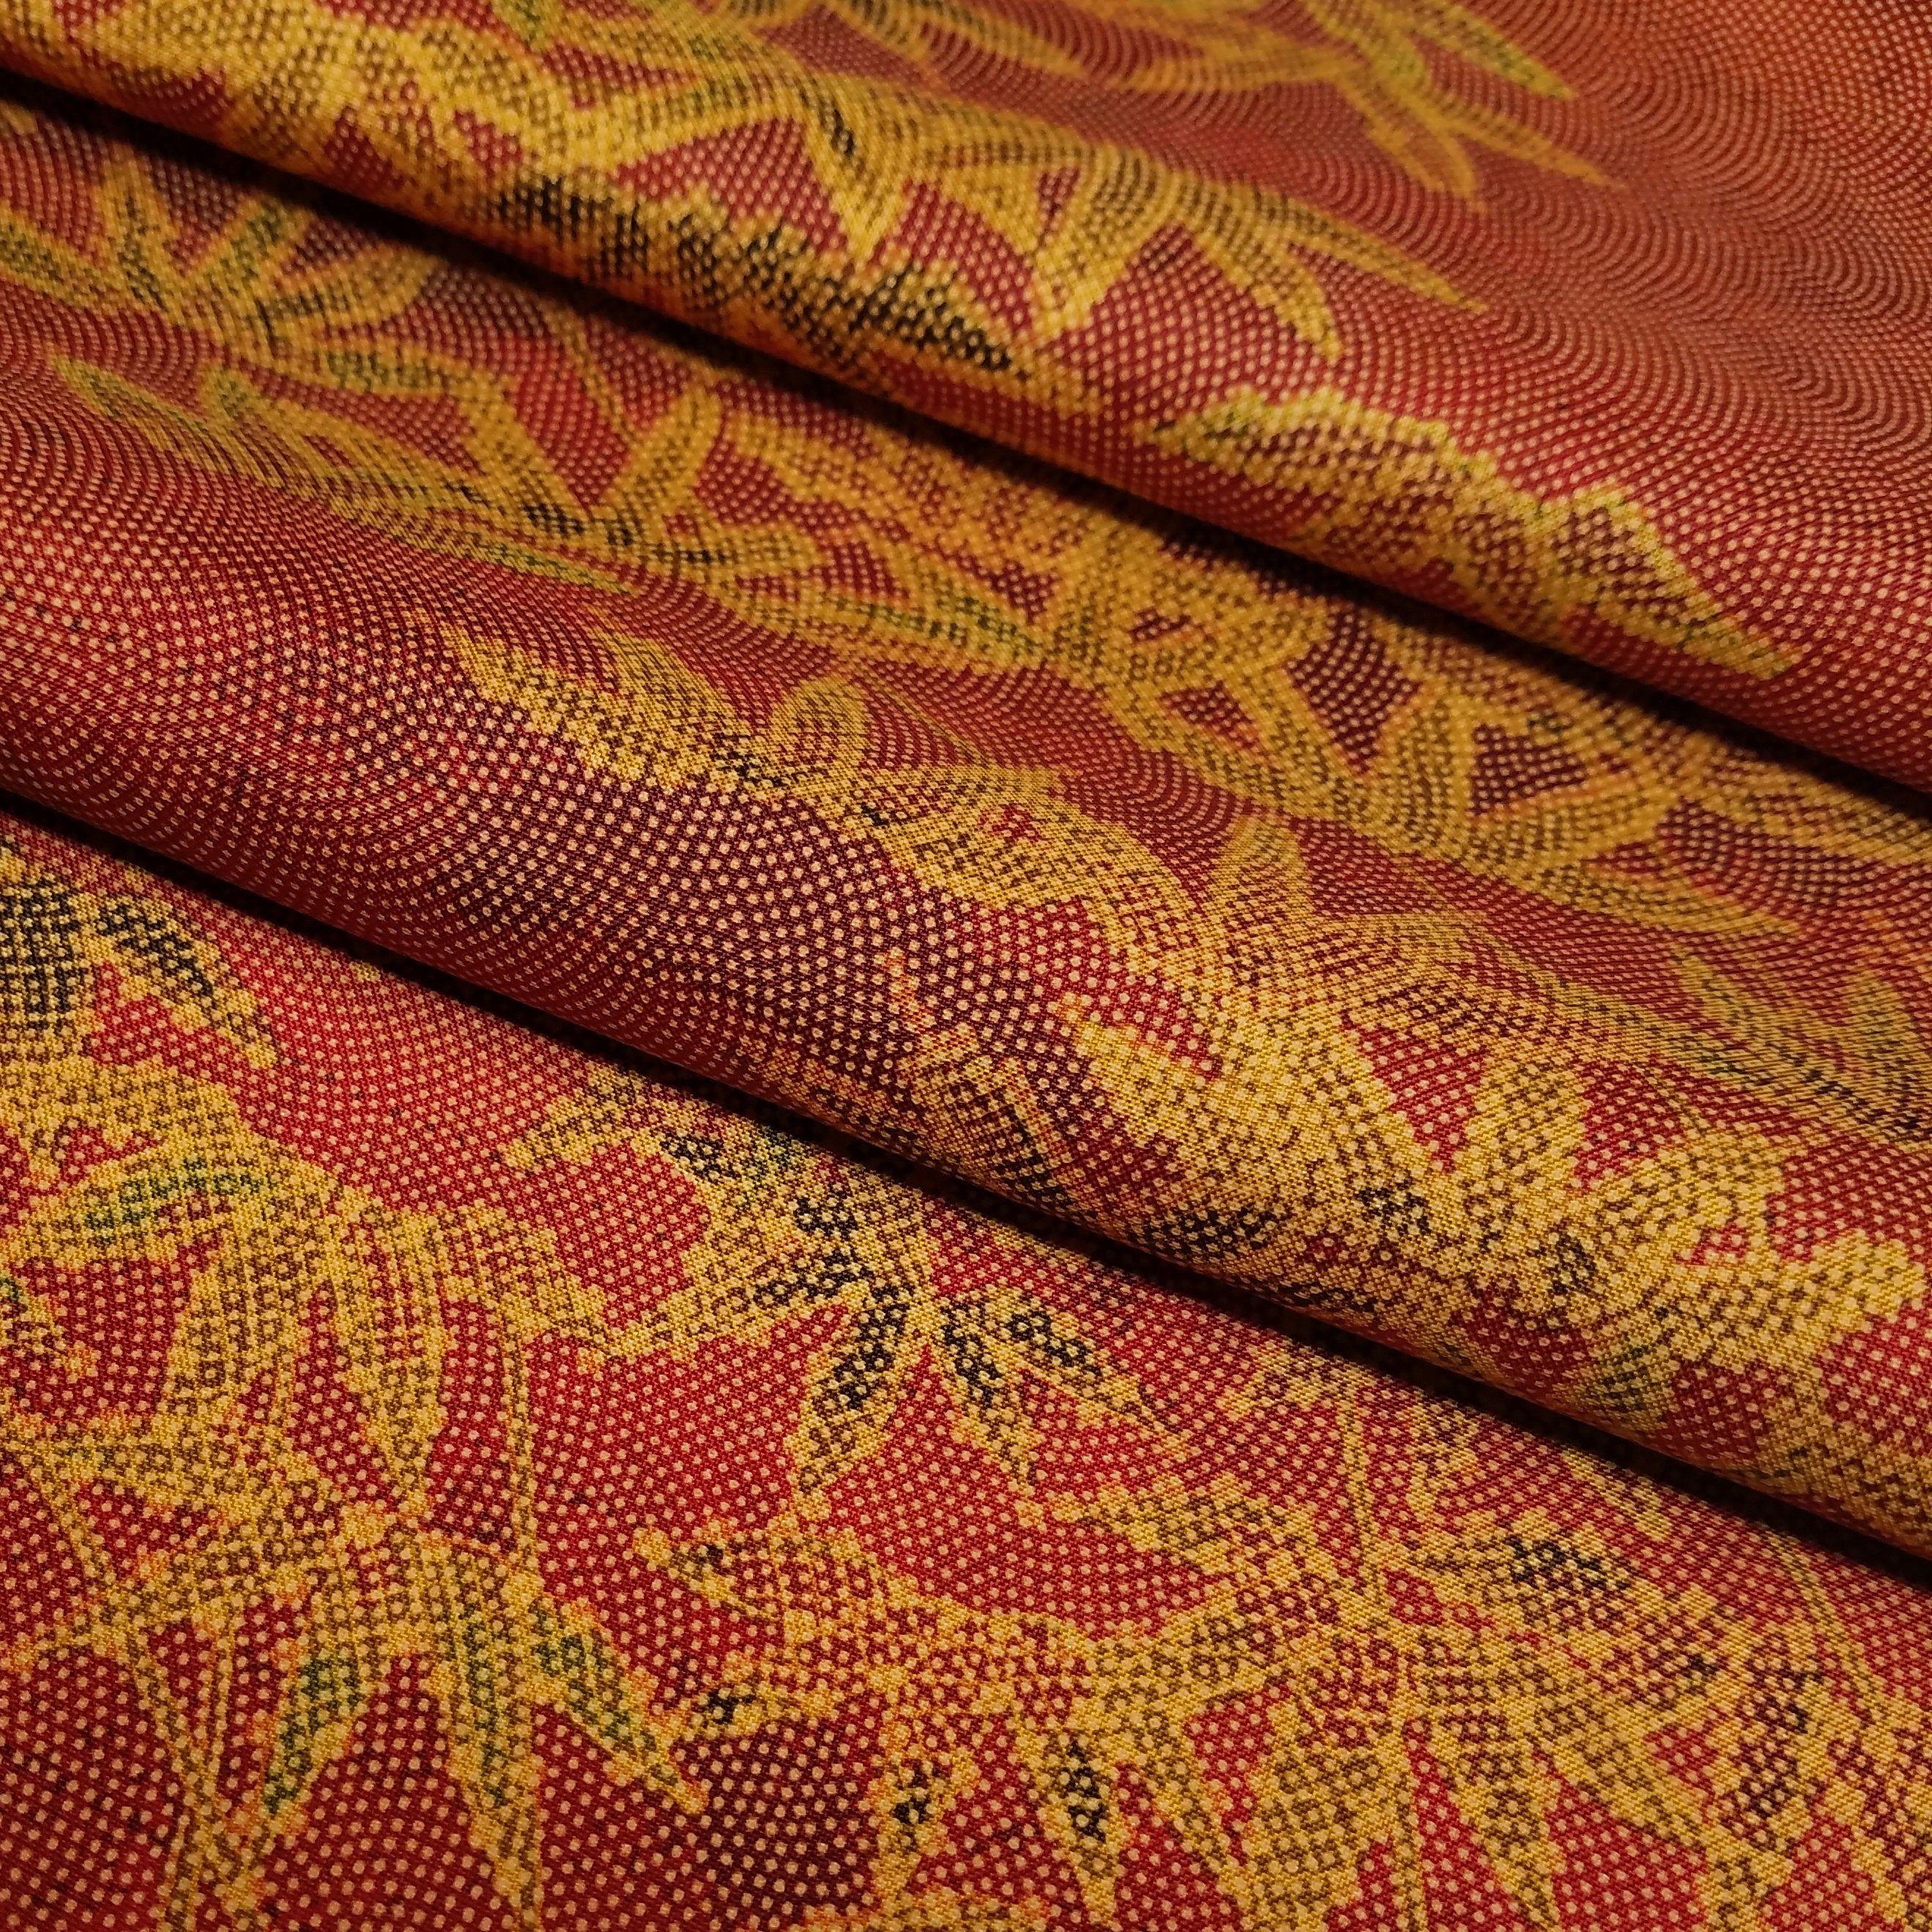 Tsumugi Pongee Silk Kimono Fabric With Golden Bamboo Design By The Yard Kimono Fabric Silk Kimono Fabric